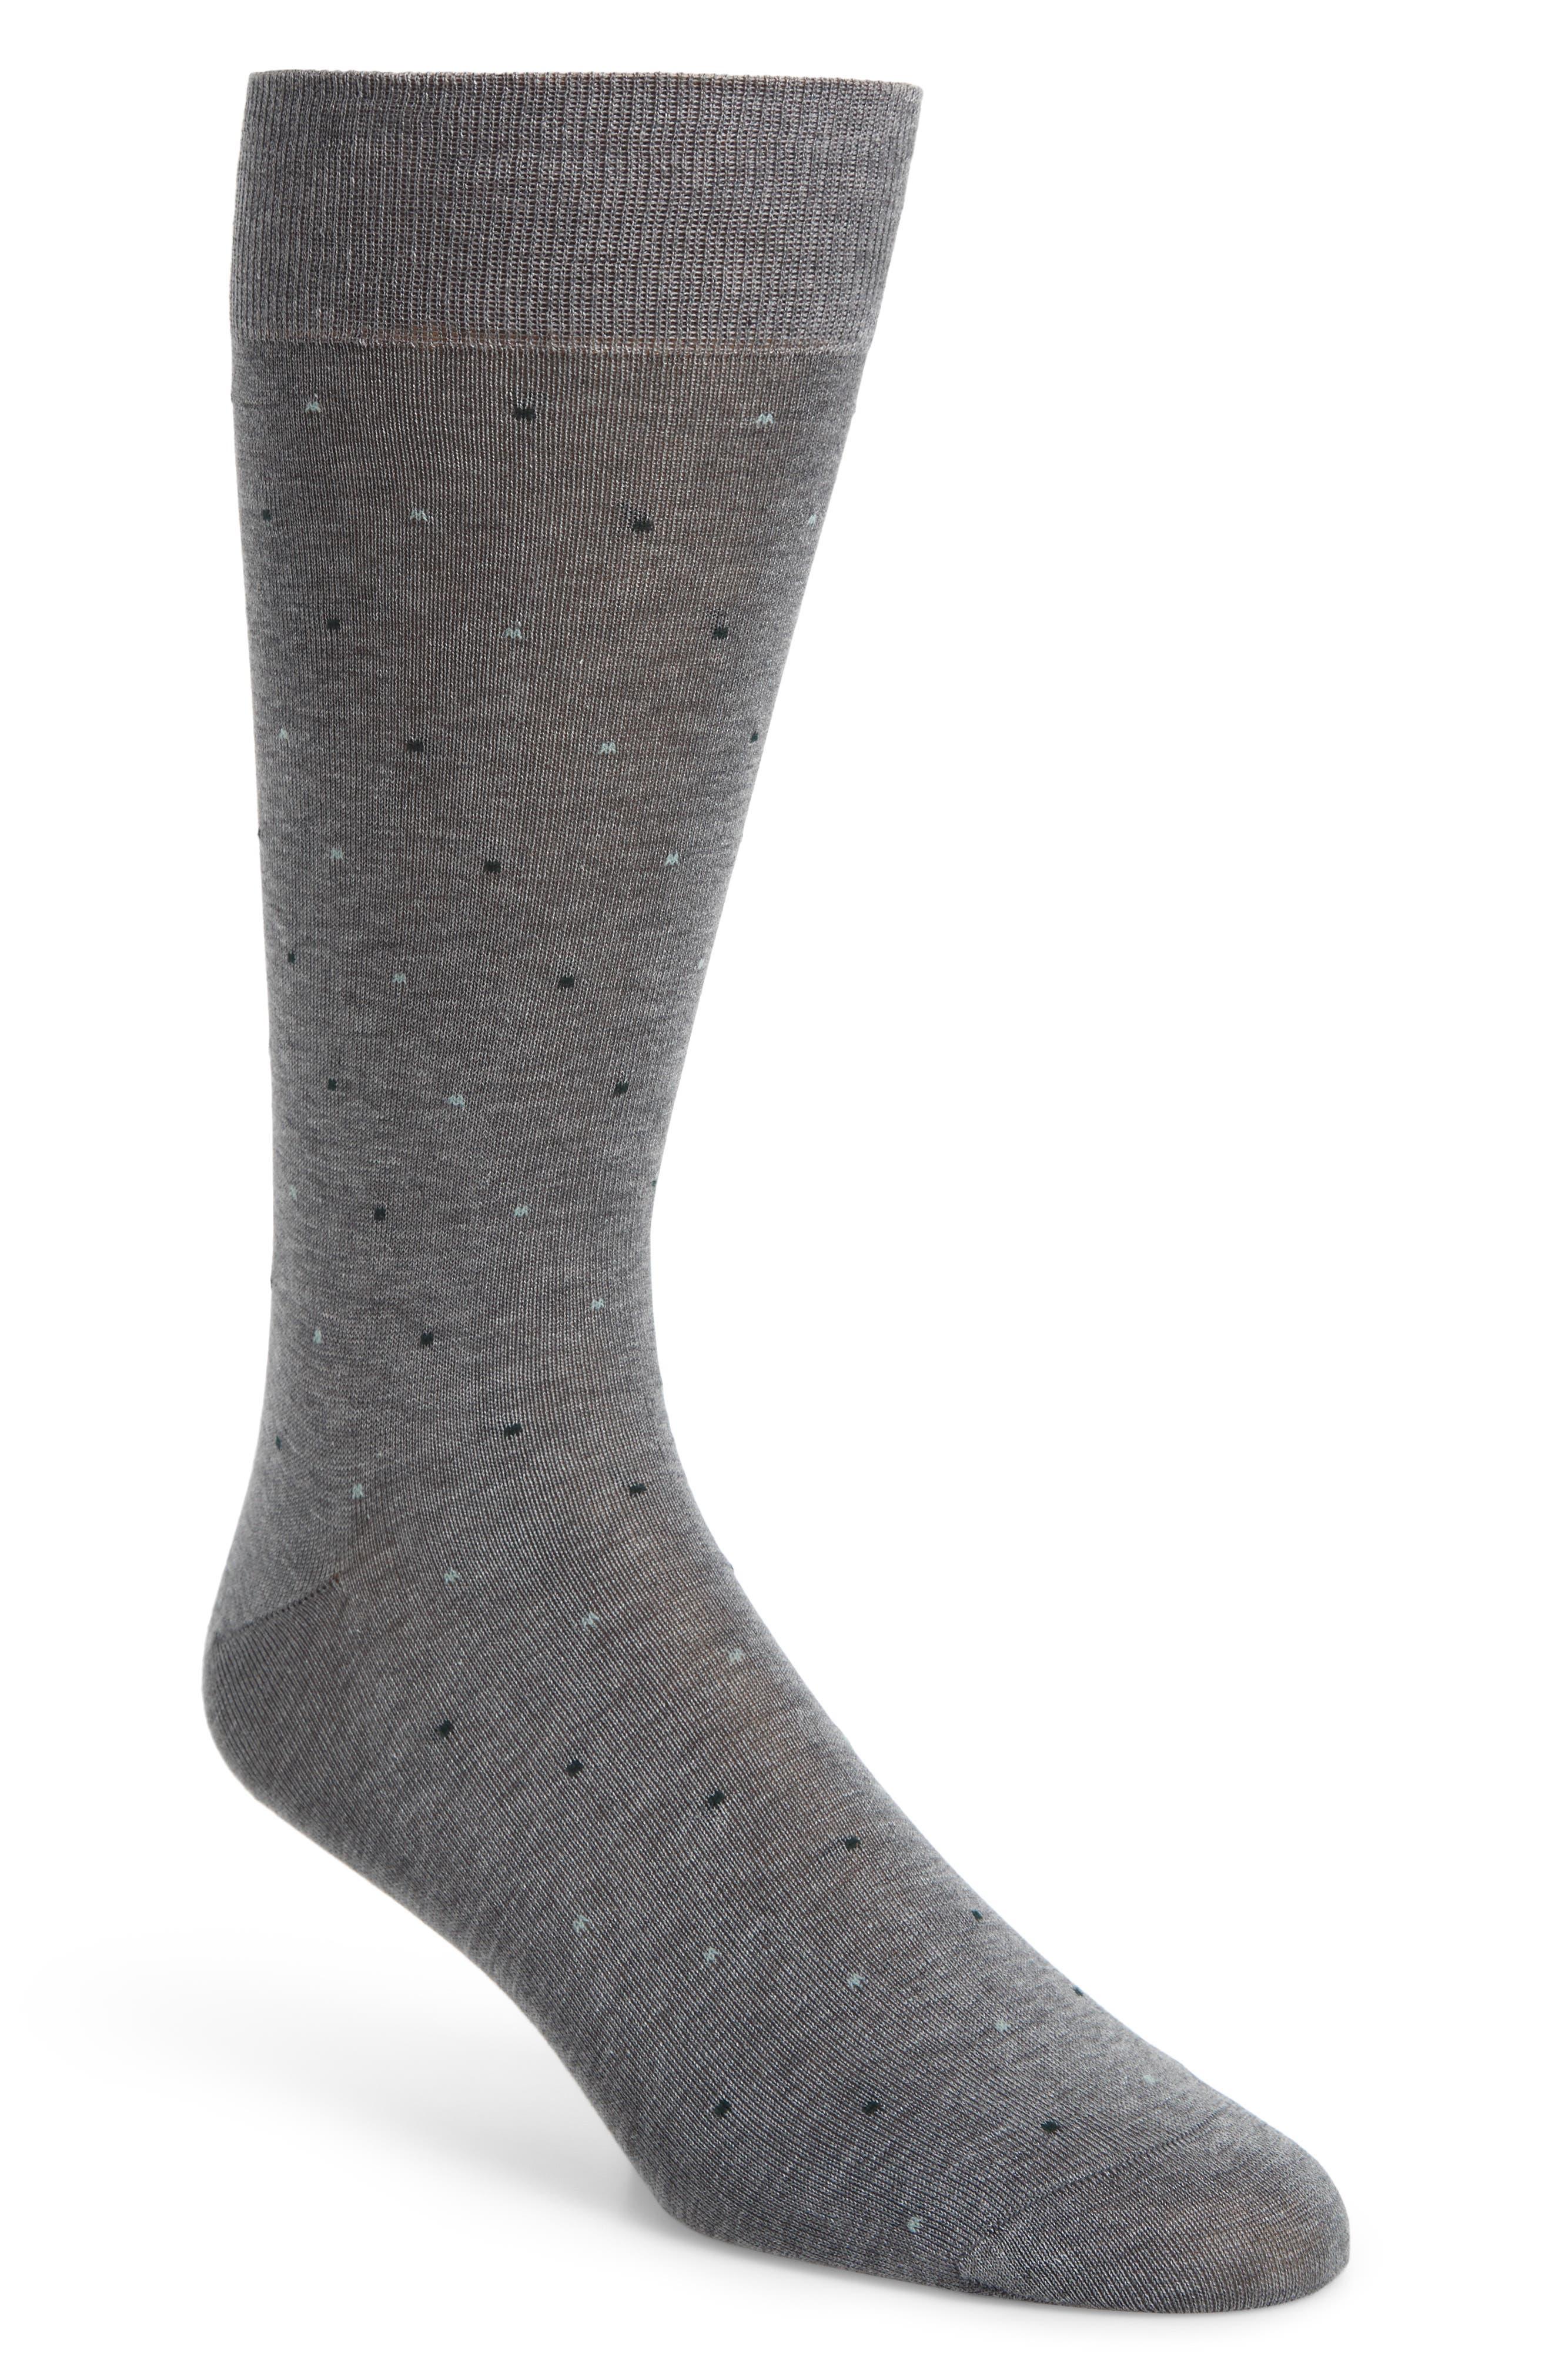 Neat Dot Socks,                             Main thumbnail 1, color,                             031